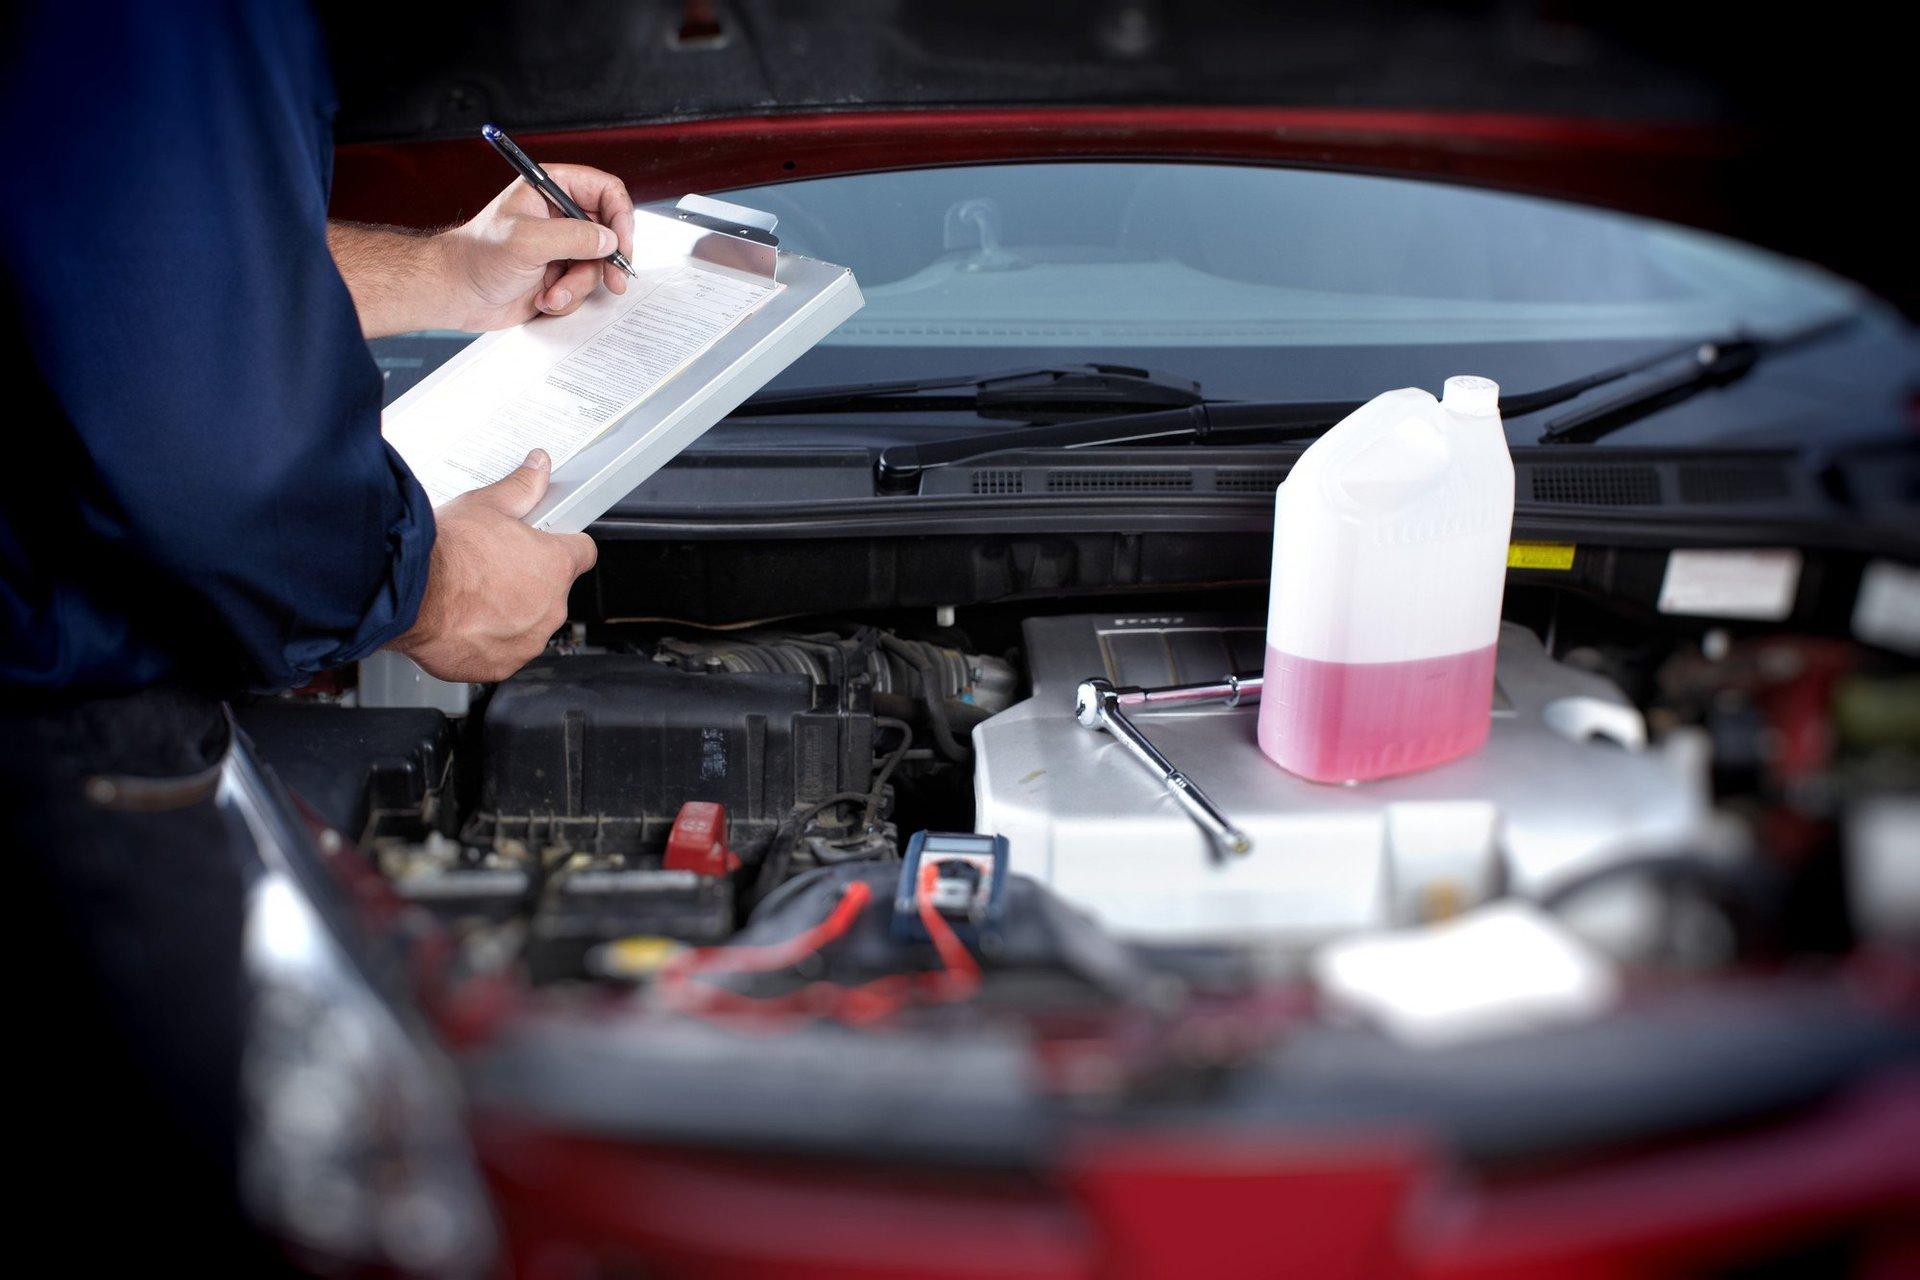 Vehicle servicing